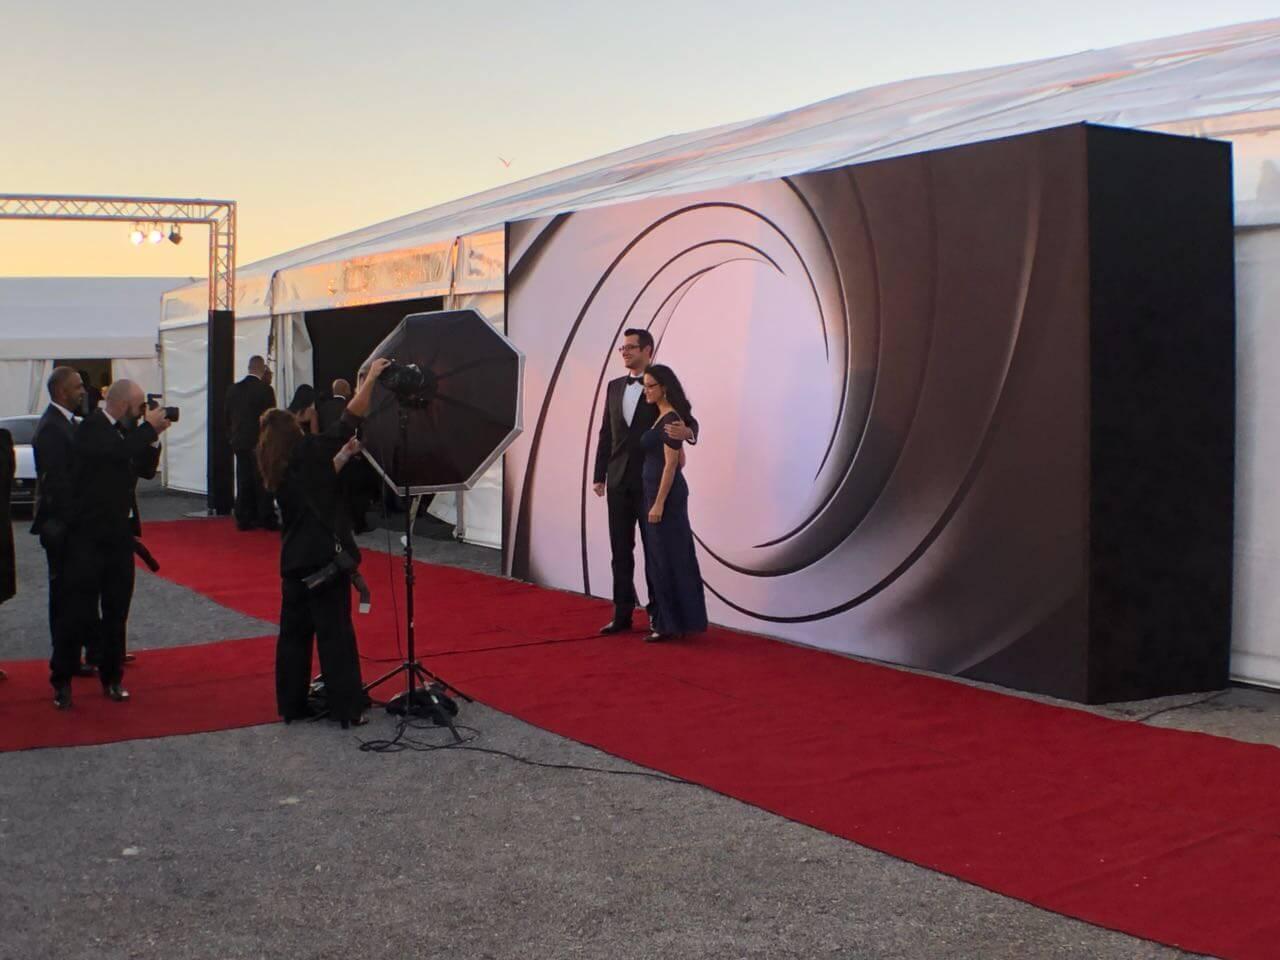 truss lighting, red carpets, photo wall - bond av direct